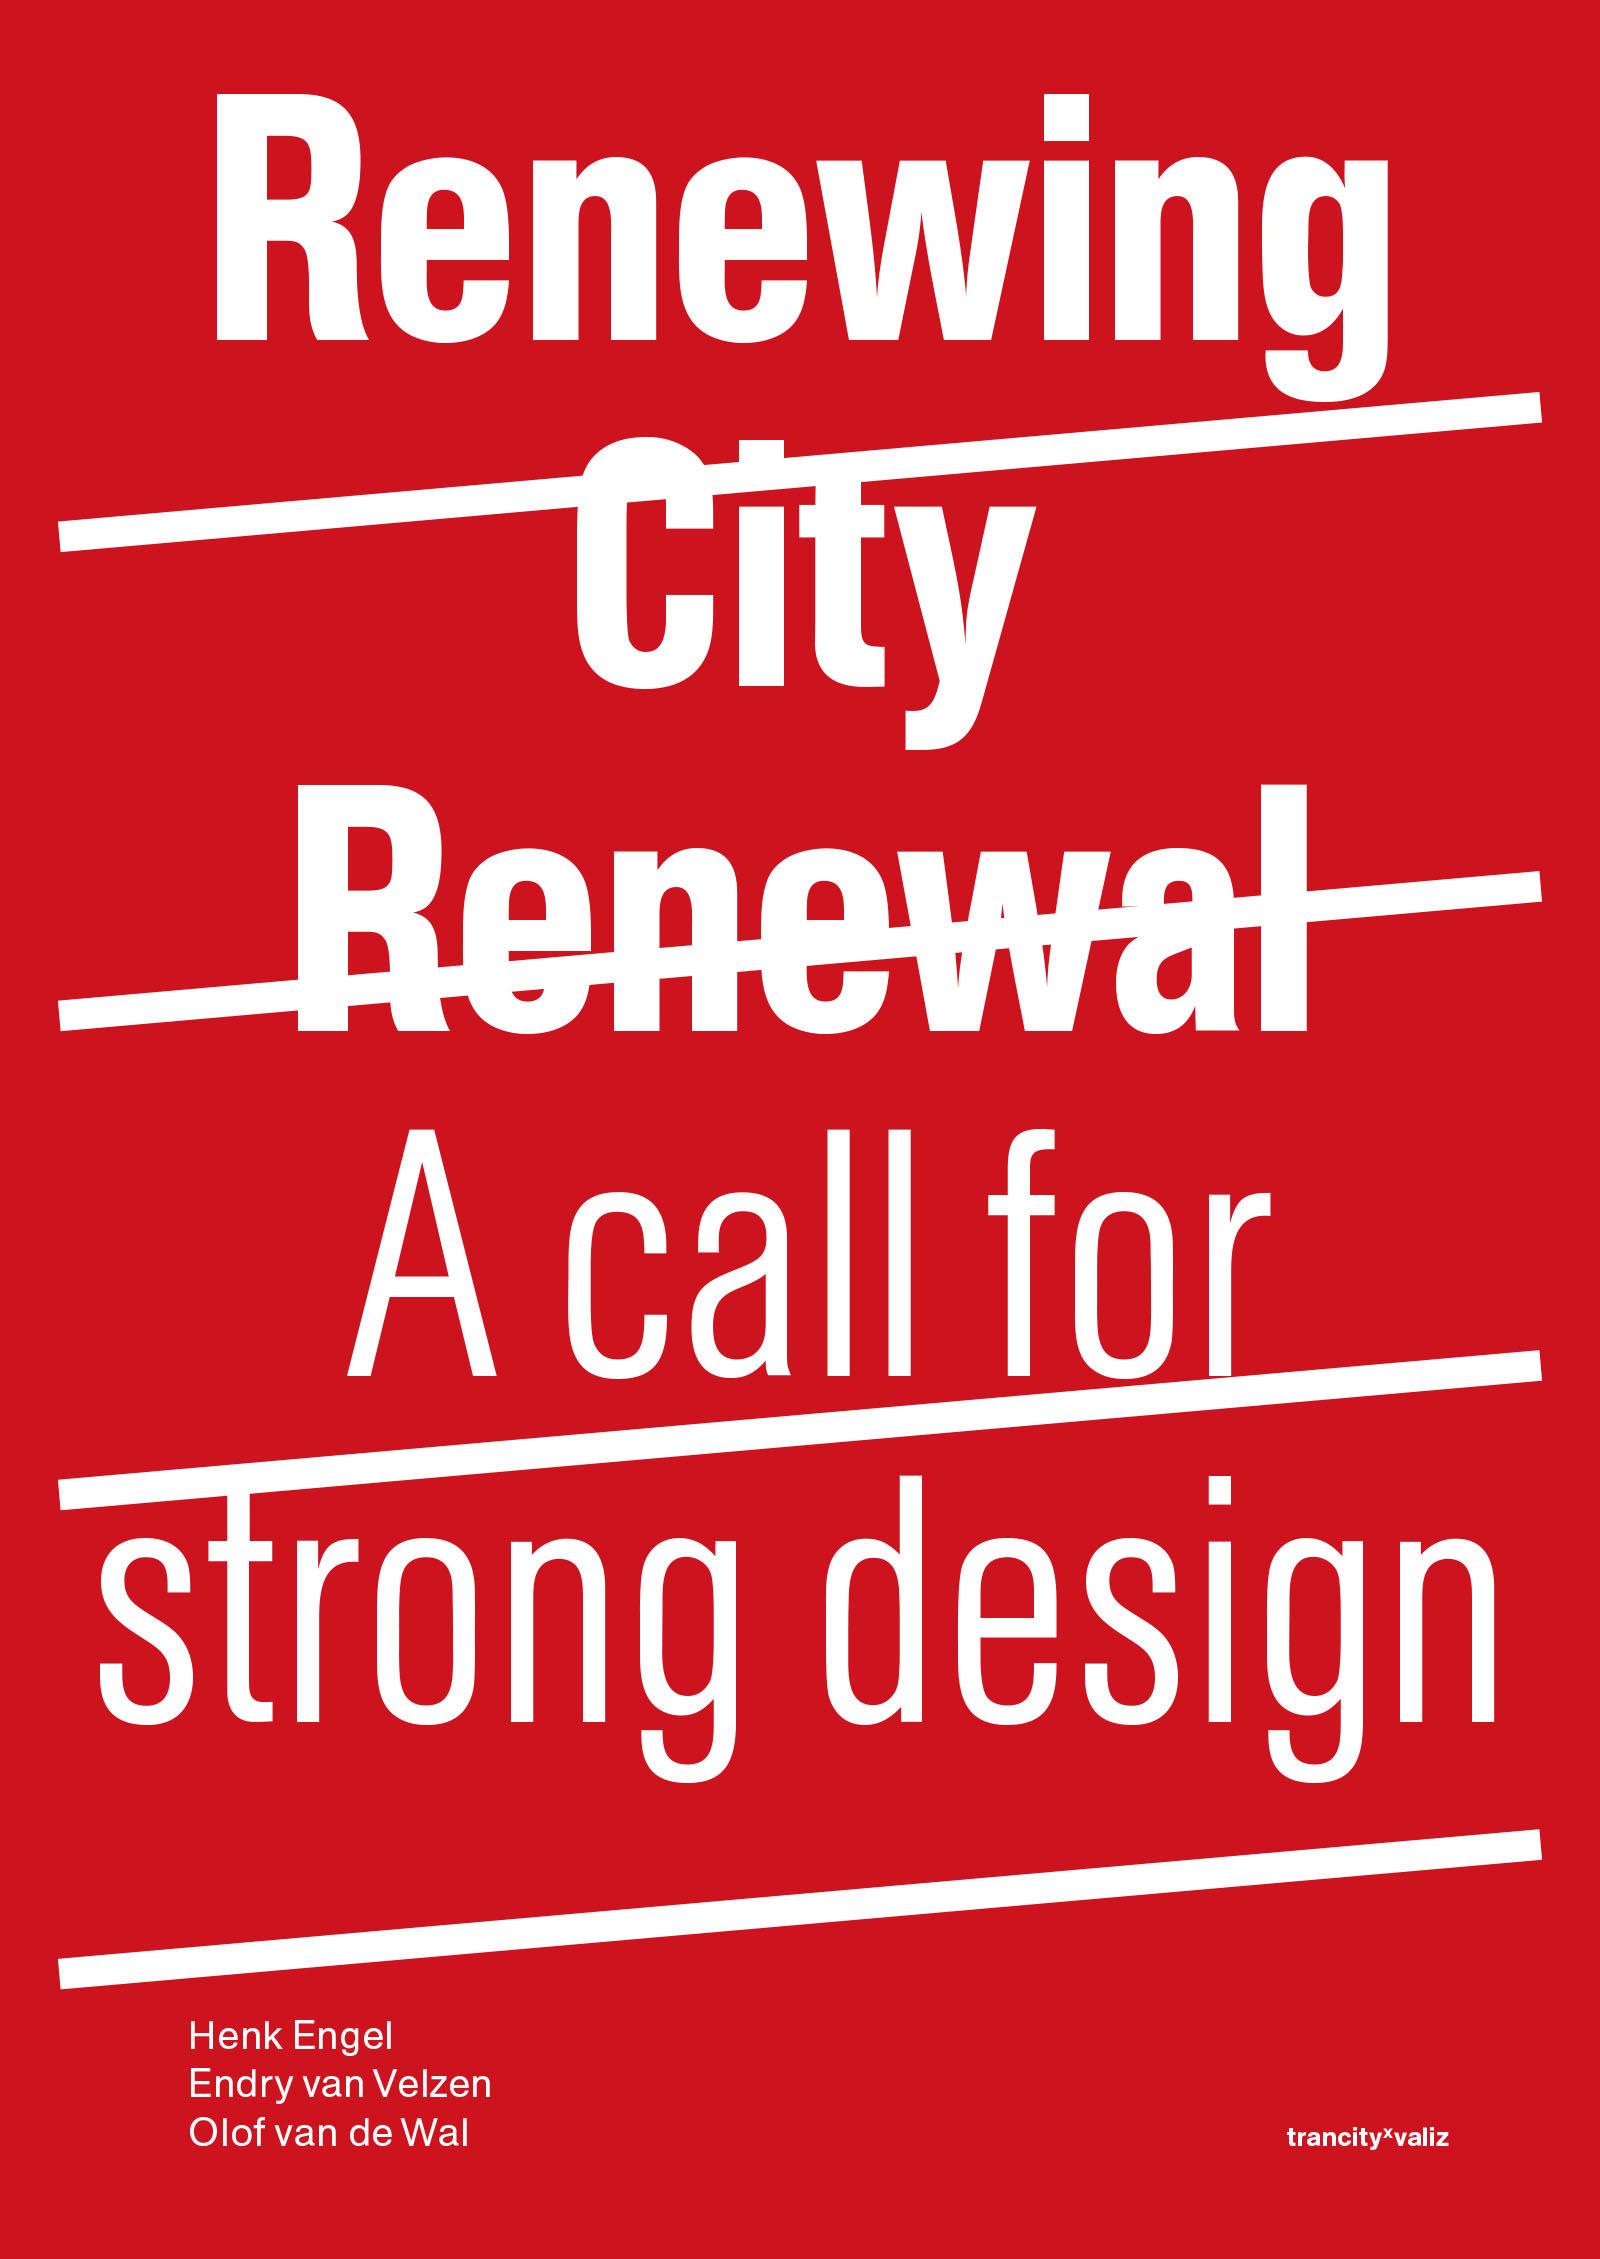 Renewing City Renewal